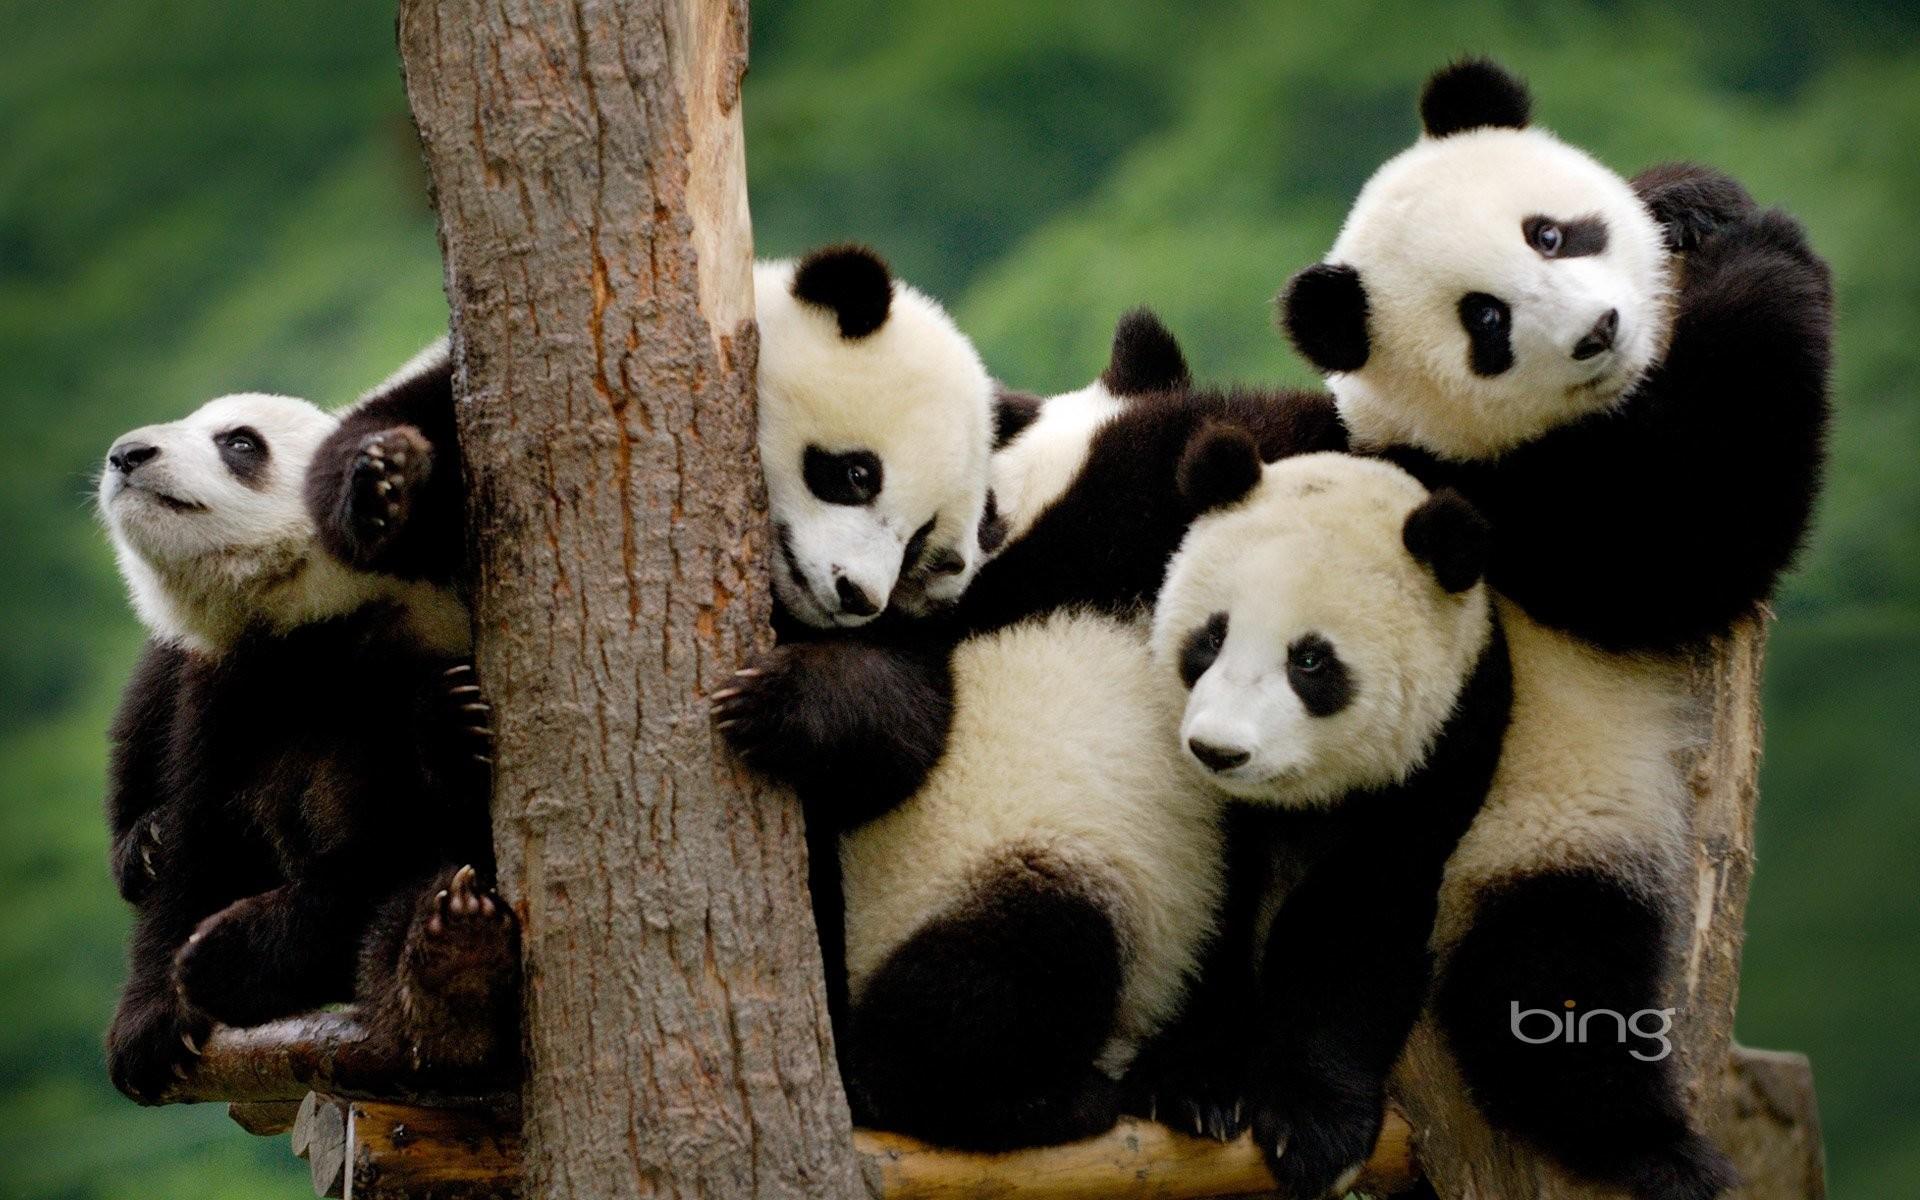 Res: 1920x1200, HD Wallpaper   Background Image ID:380354.  Animal Panda